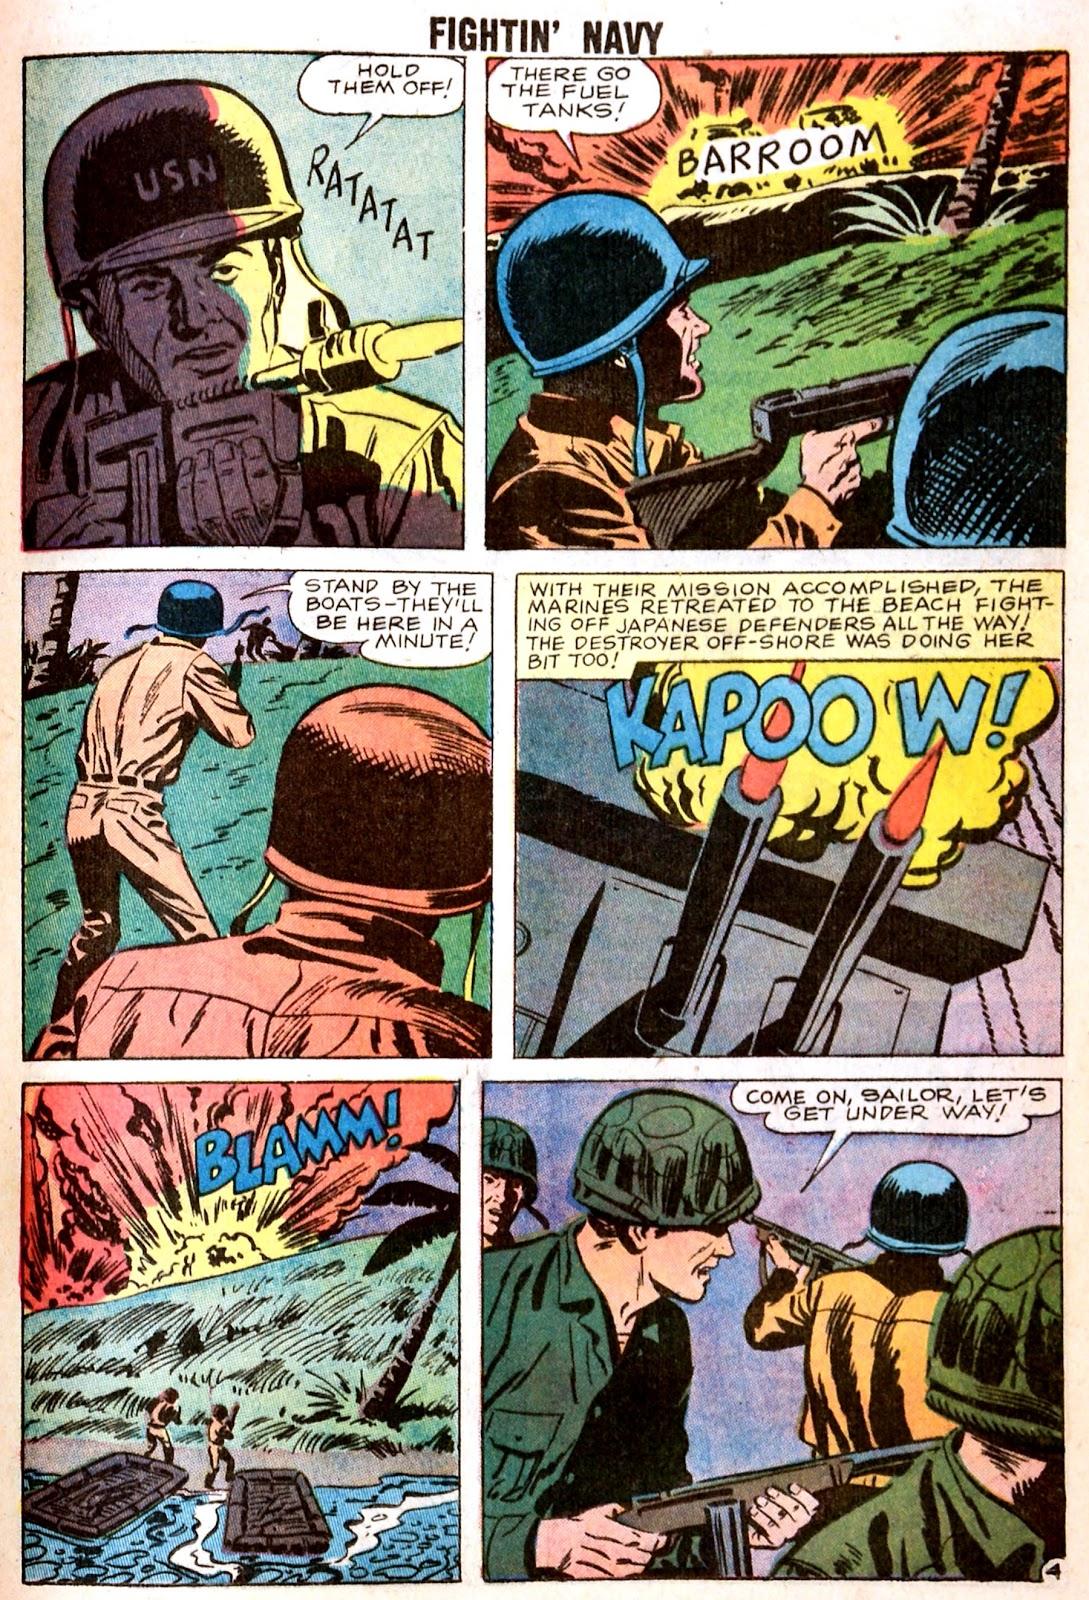 Read online Fightin' Navy comic -  Issue #85 - 17